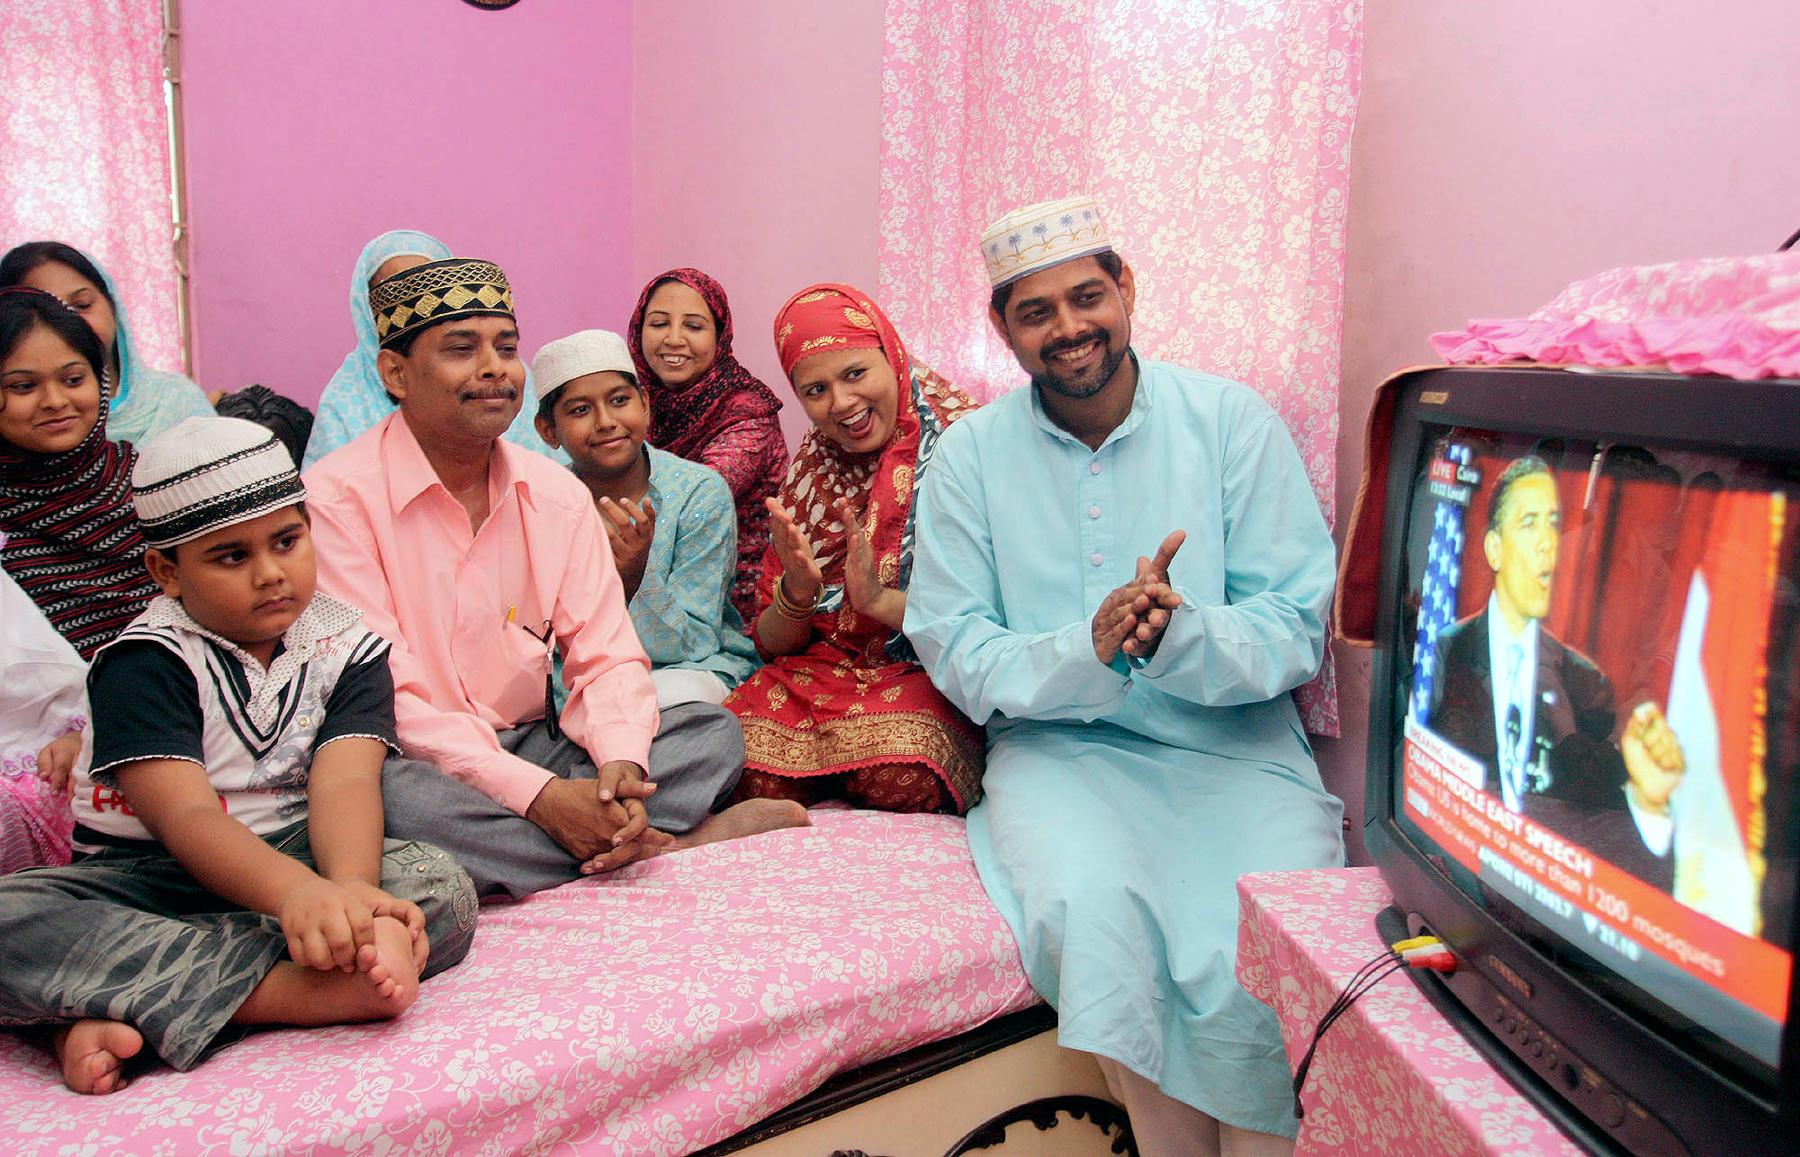 People sitting in room watching TV (© AP Images)